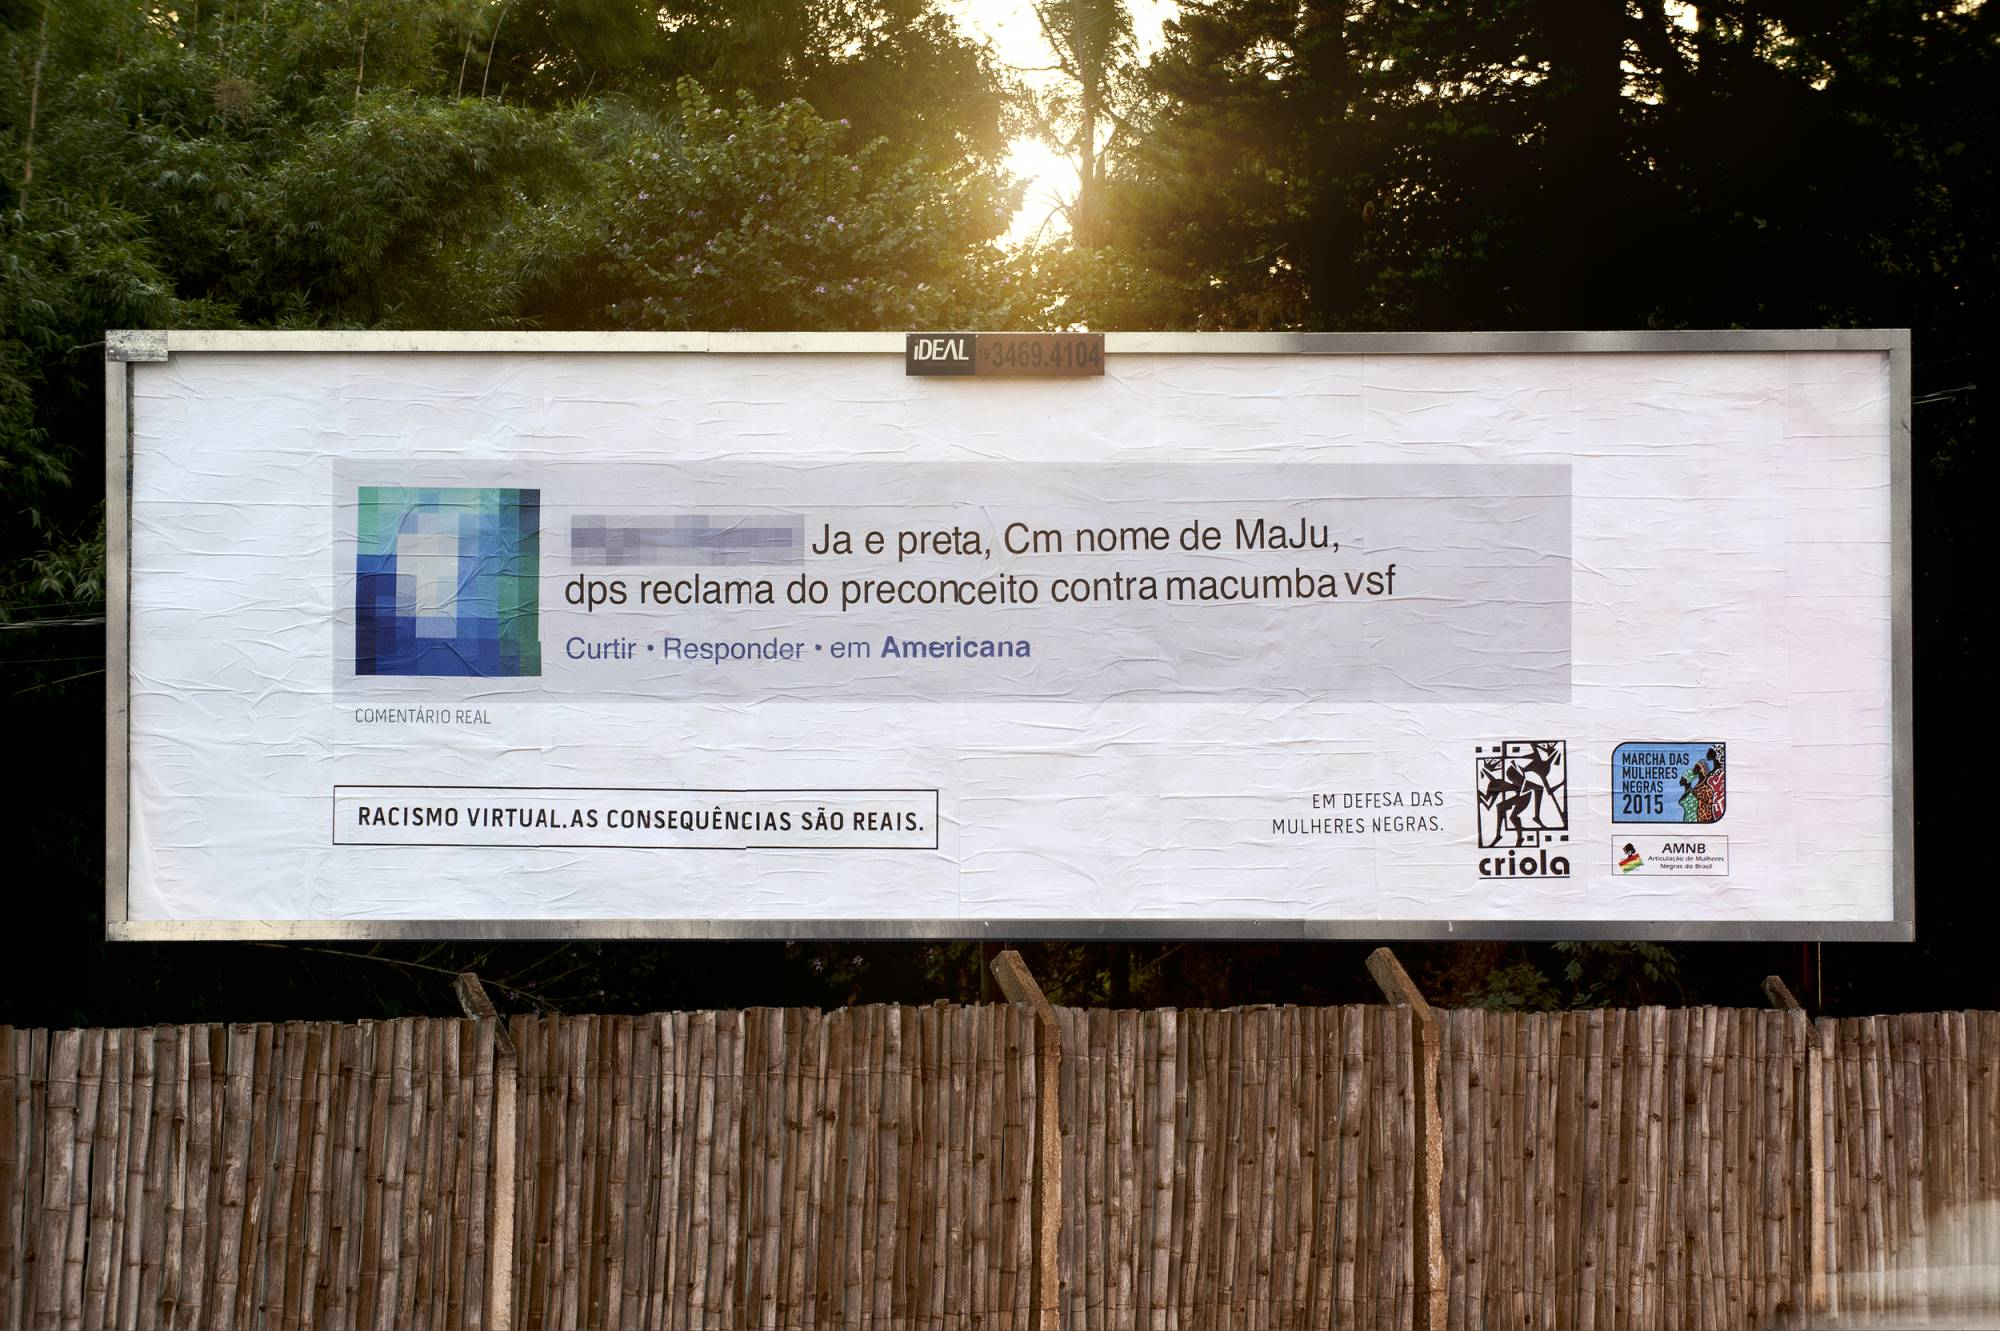 campanha-racismo-outdoors2